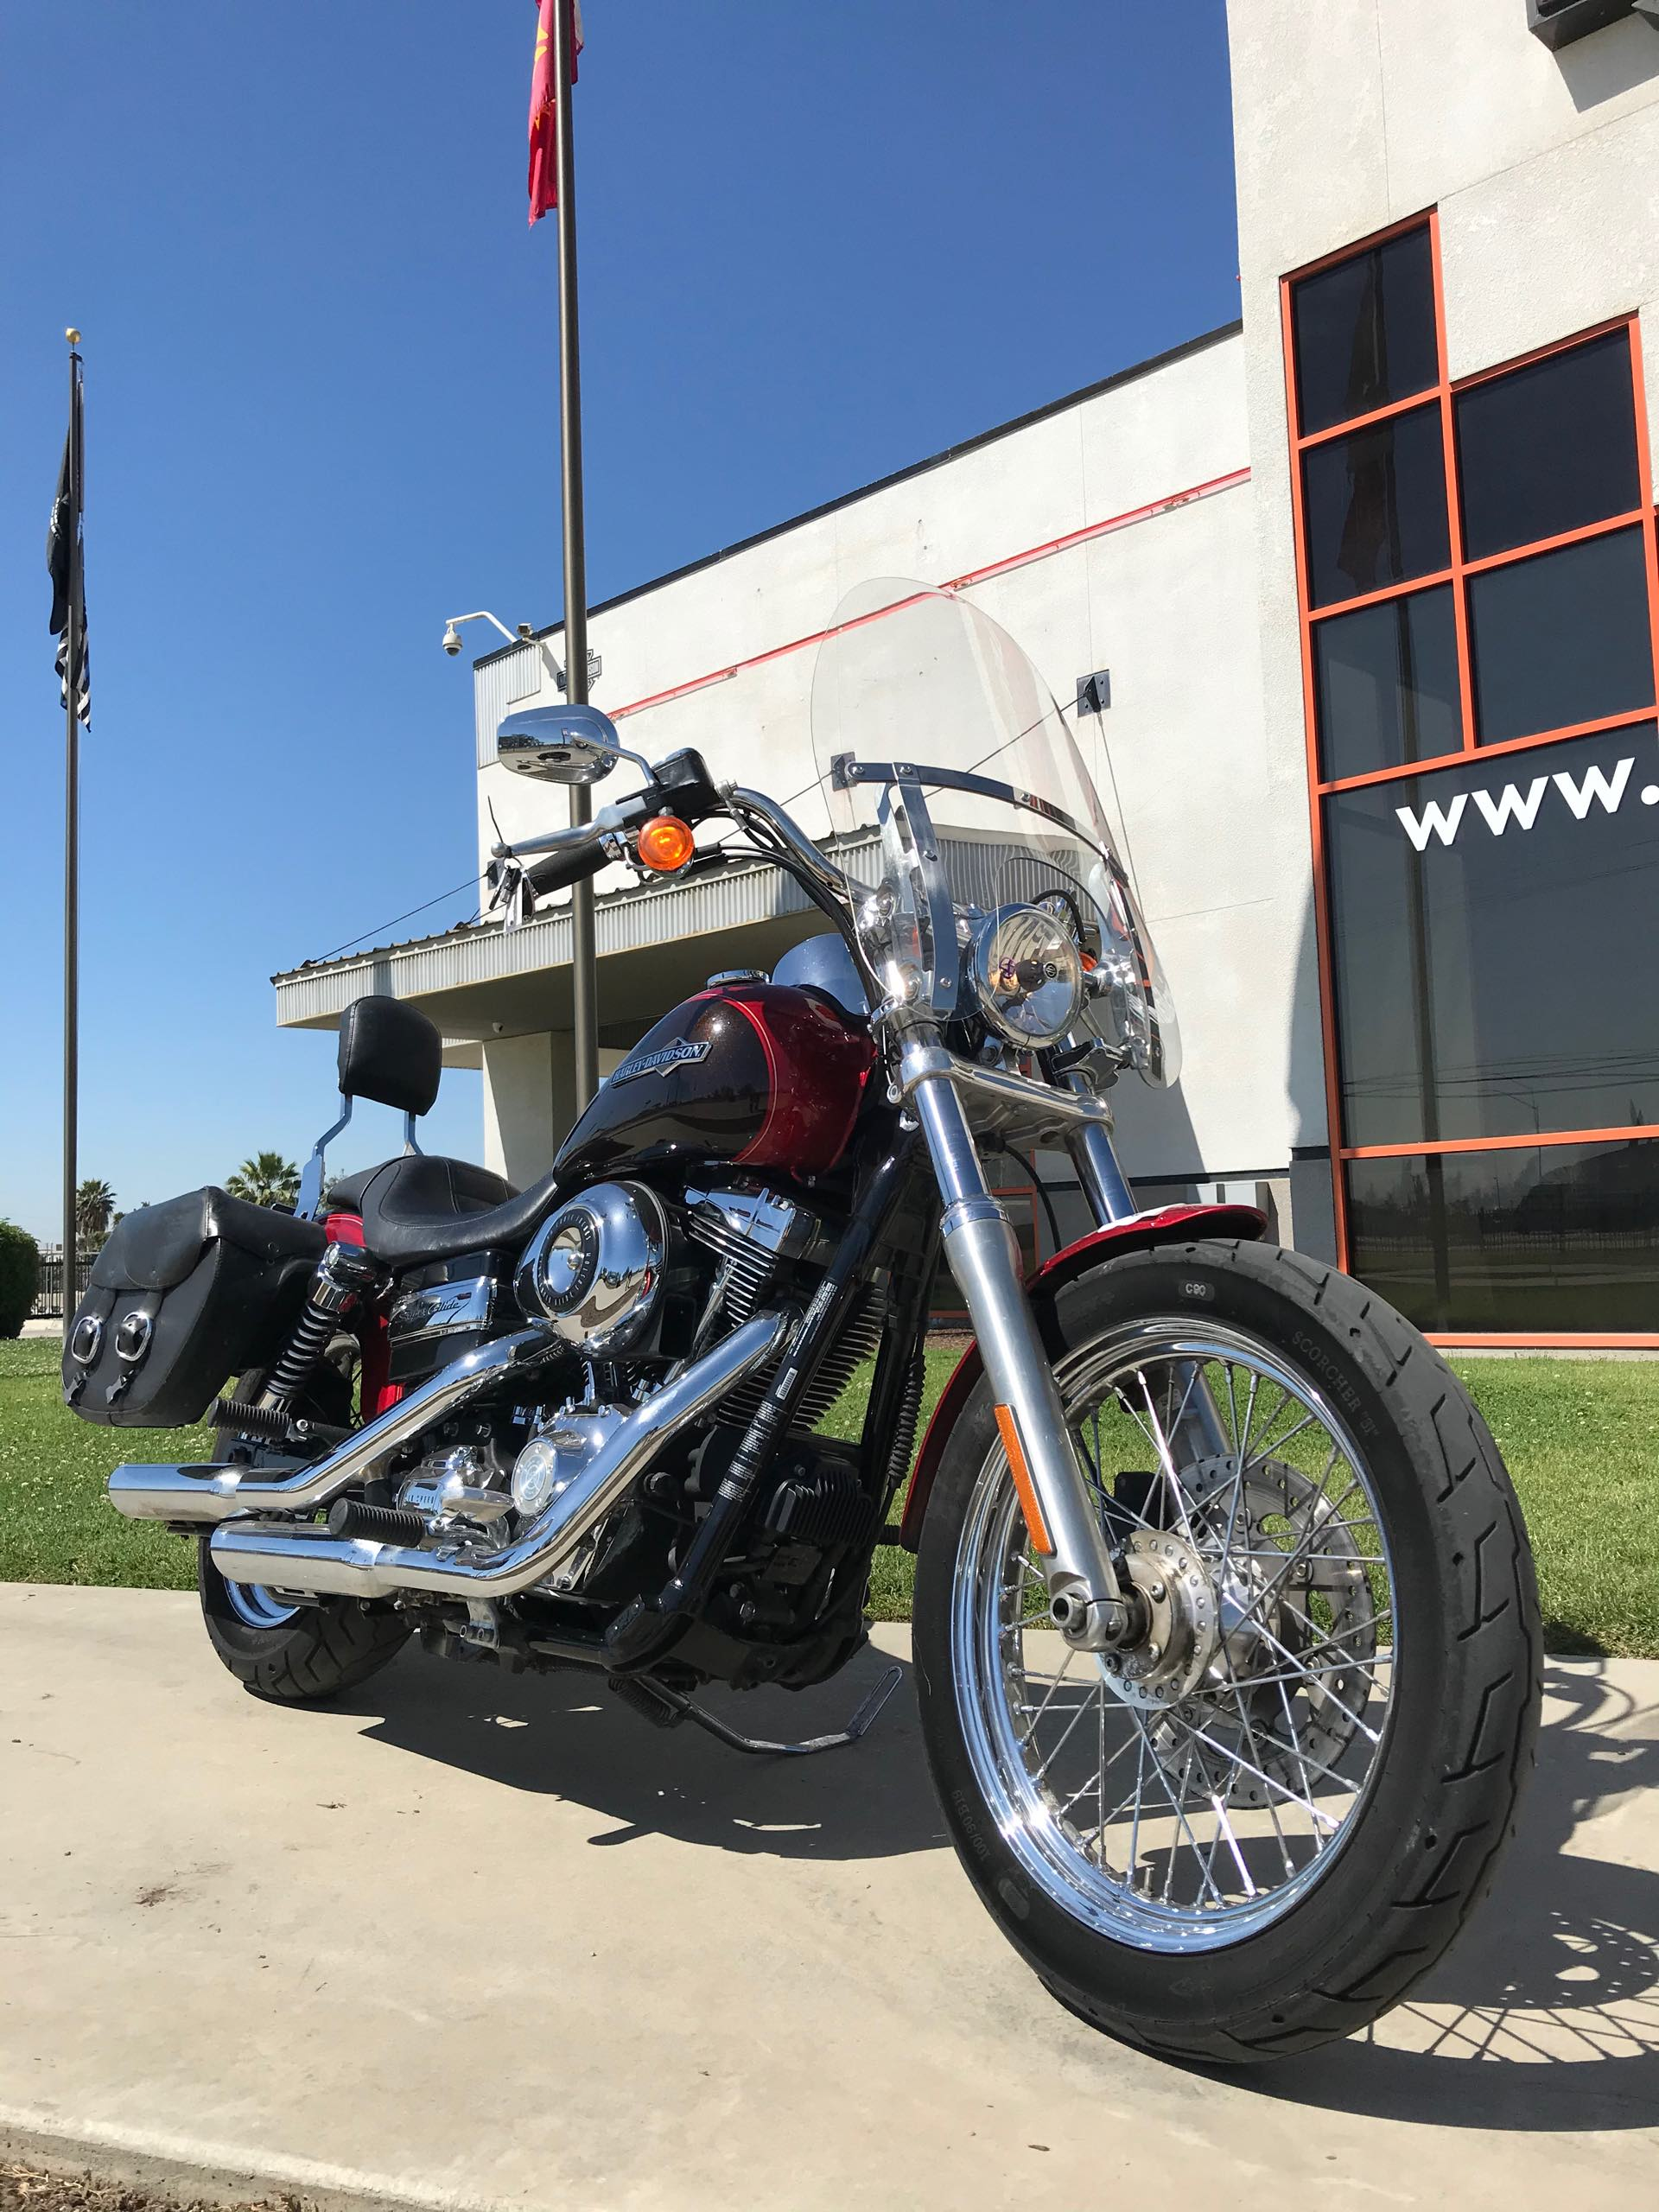 2012 Harley-Davidson Dyna Glide Super Glide Custom at Visalia Harley-Davidson